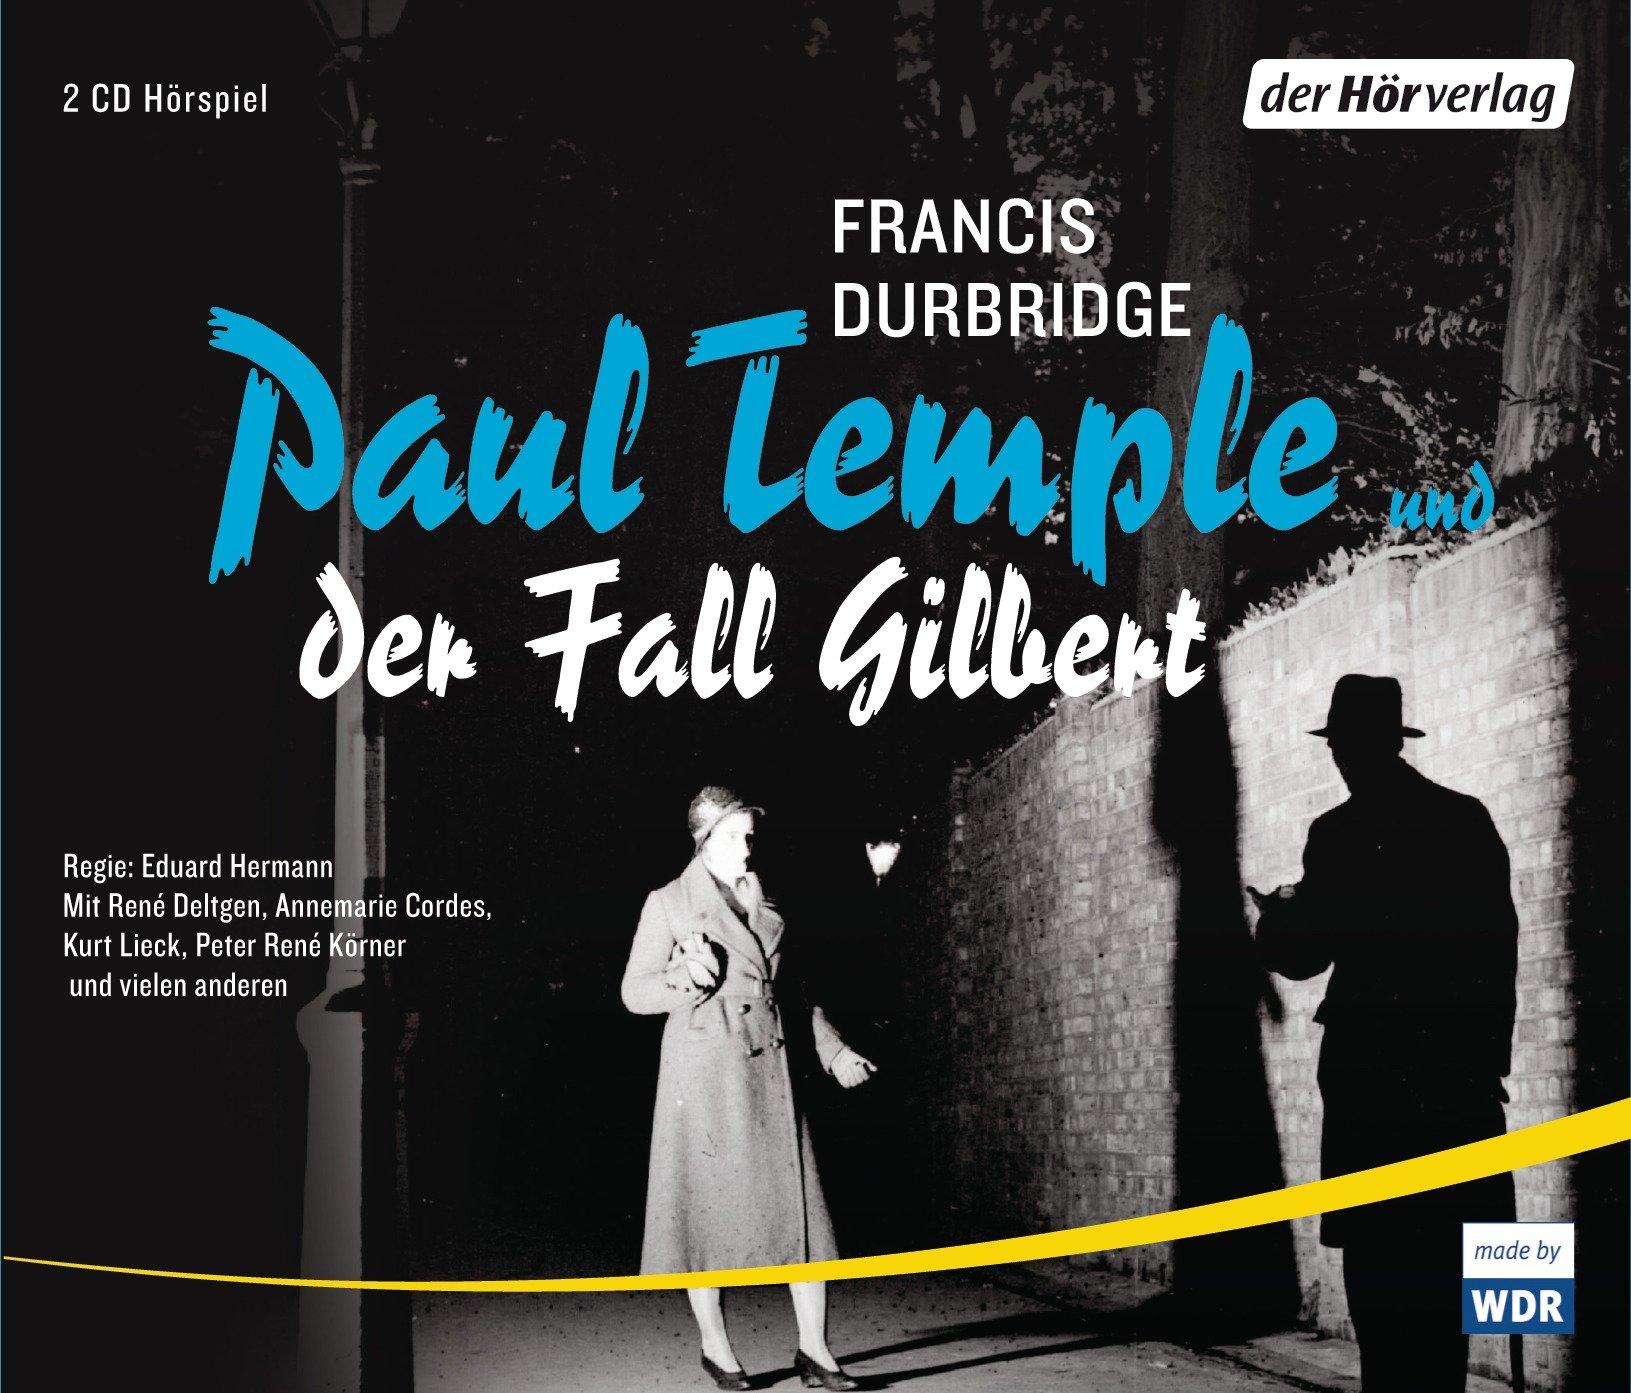 Paul Temple und der Fall Gilbert / hörverlag